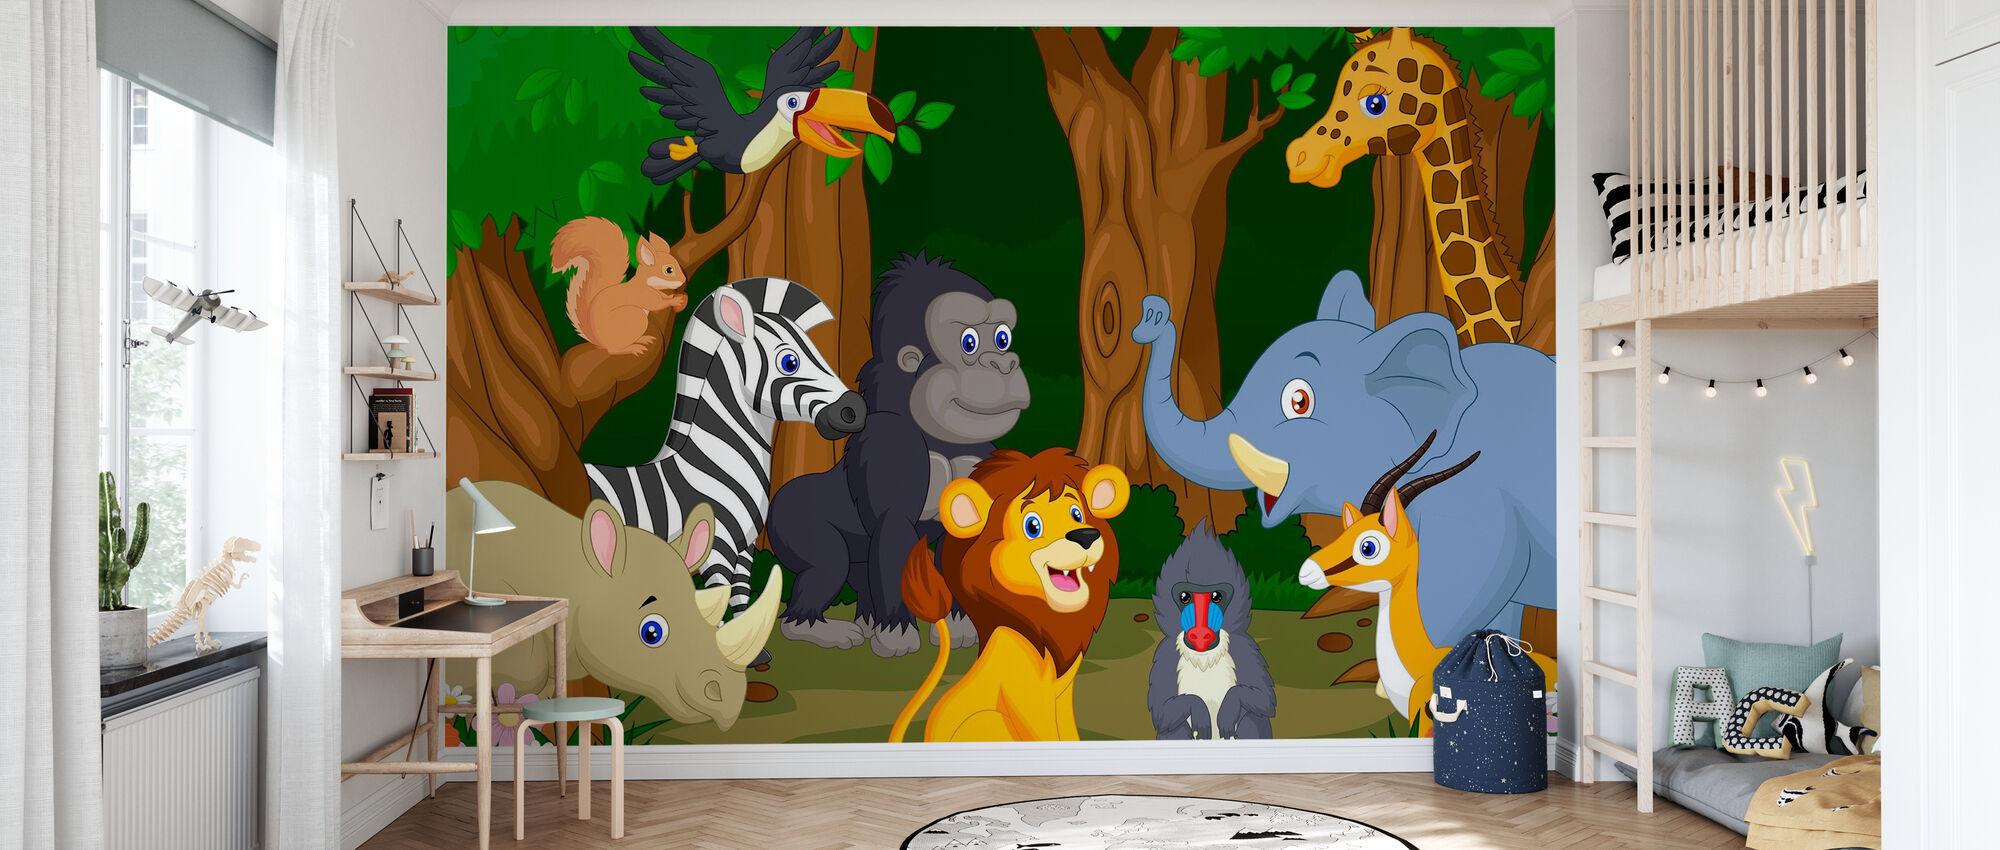 Wild Animal Cartoon - Wallpaper - Kids Room